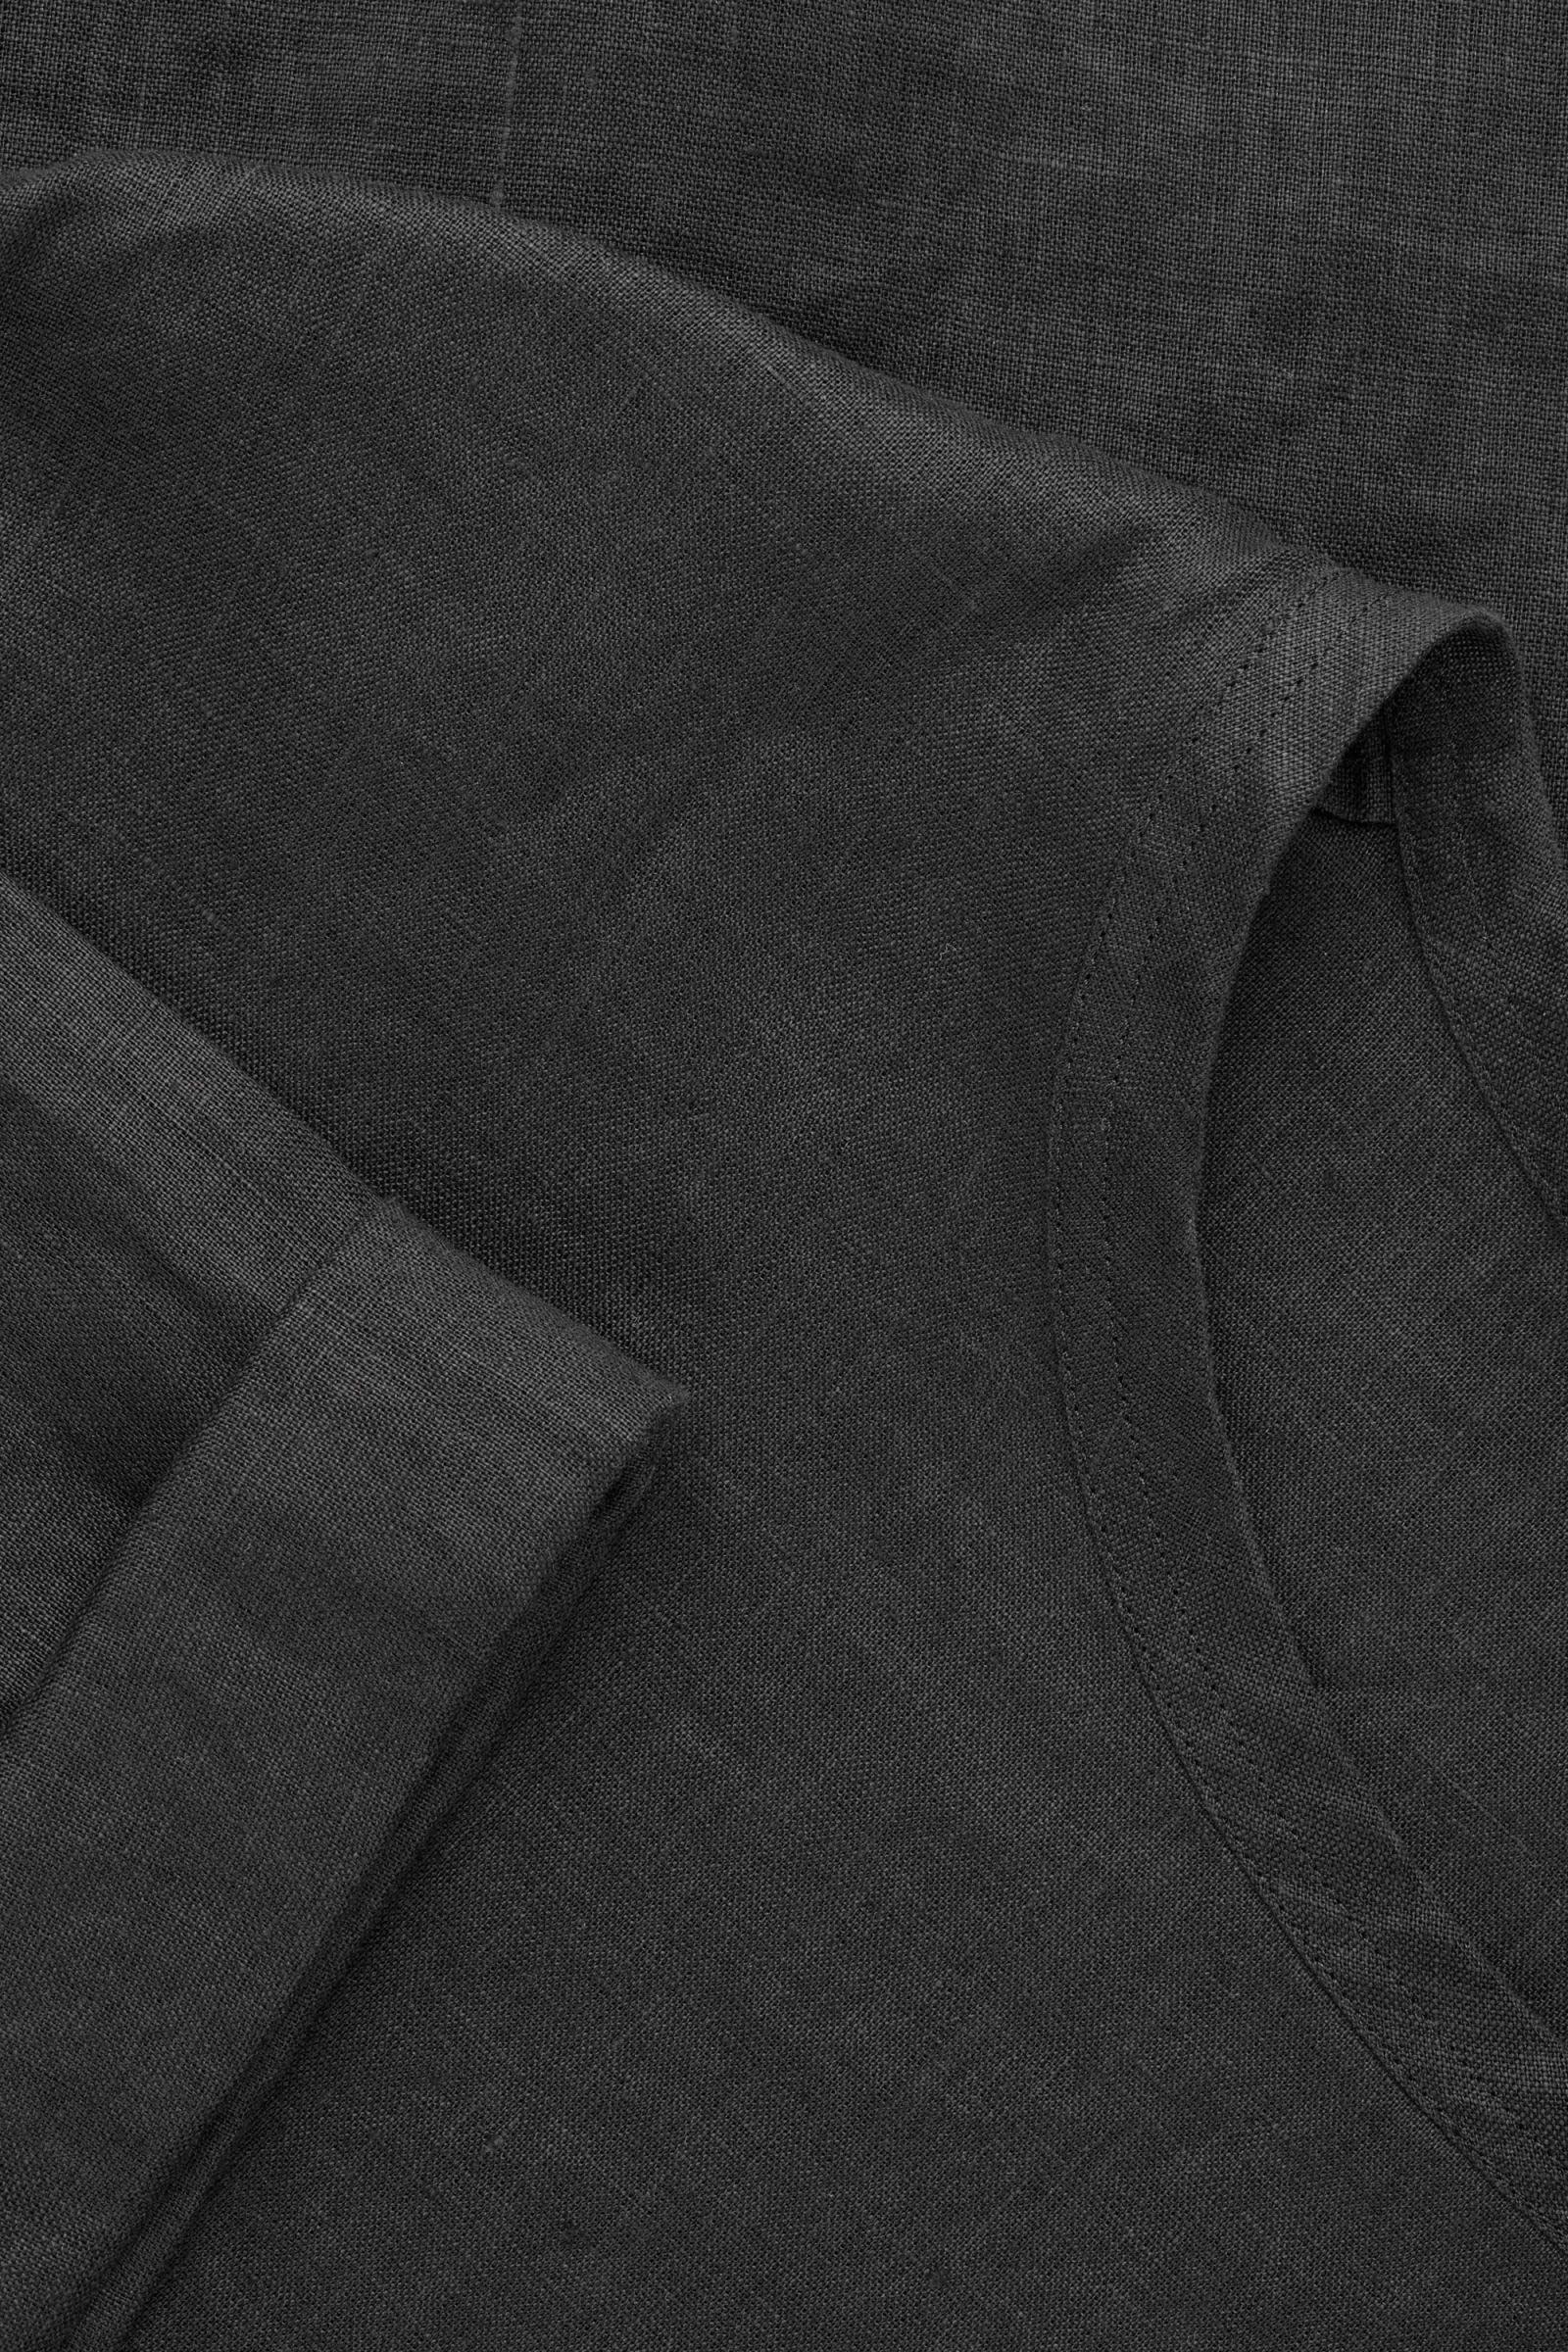 COS 오버사이즈 리넨 티셔츠의 블랙컬러 Product입니다.